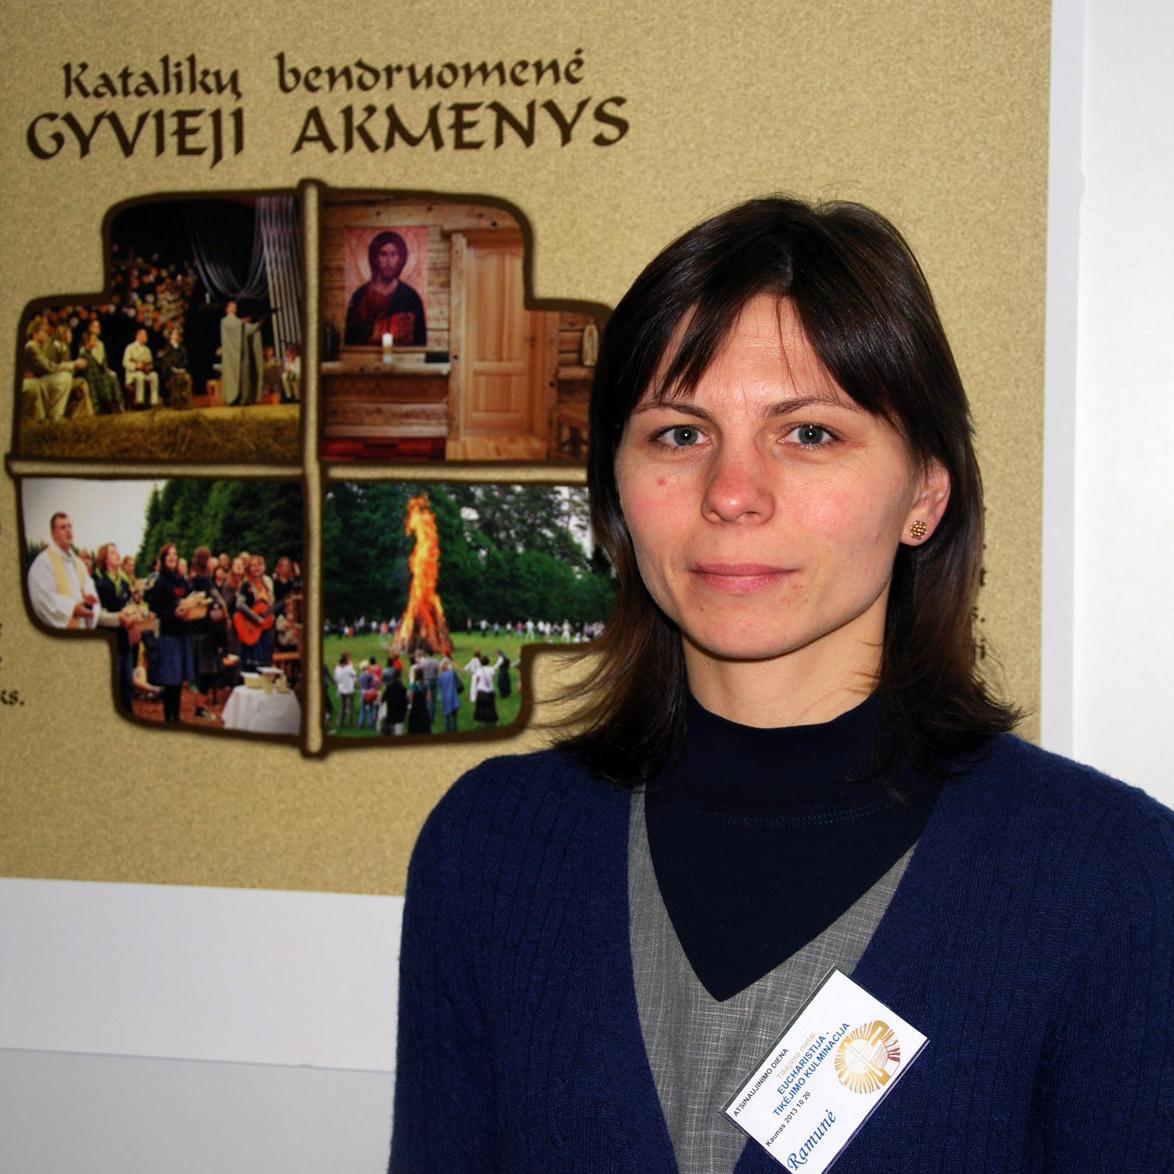 Ramunė Obelenienė